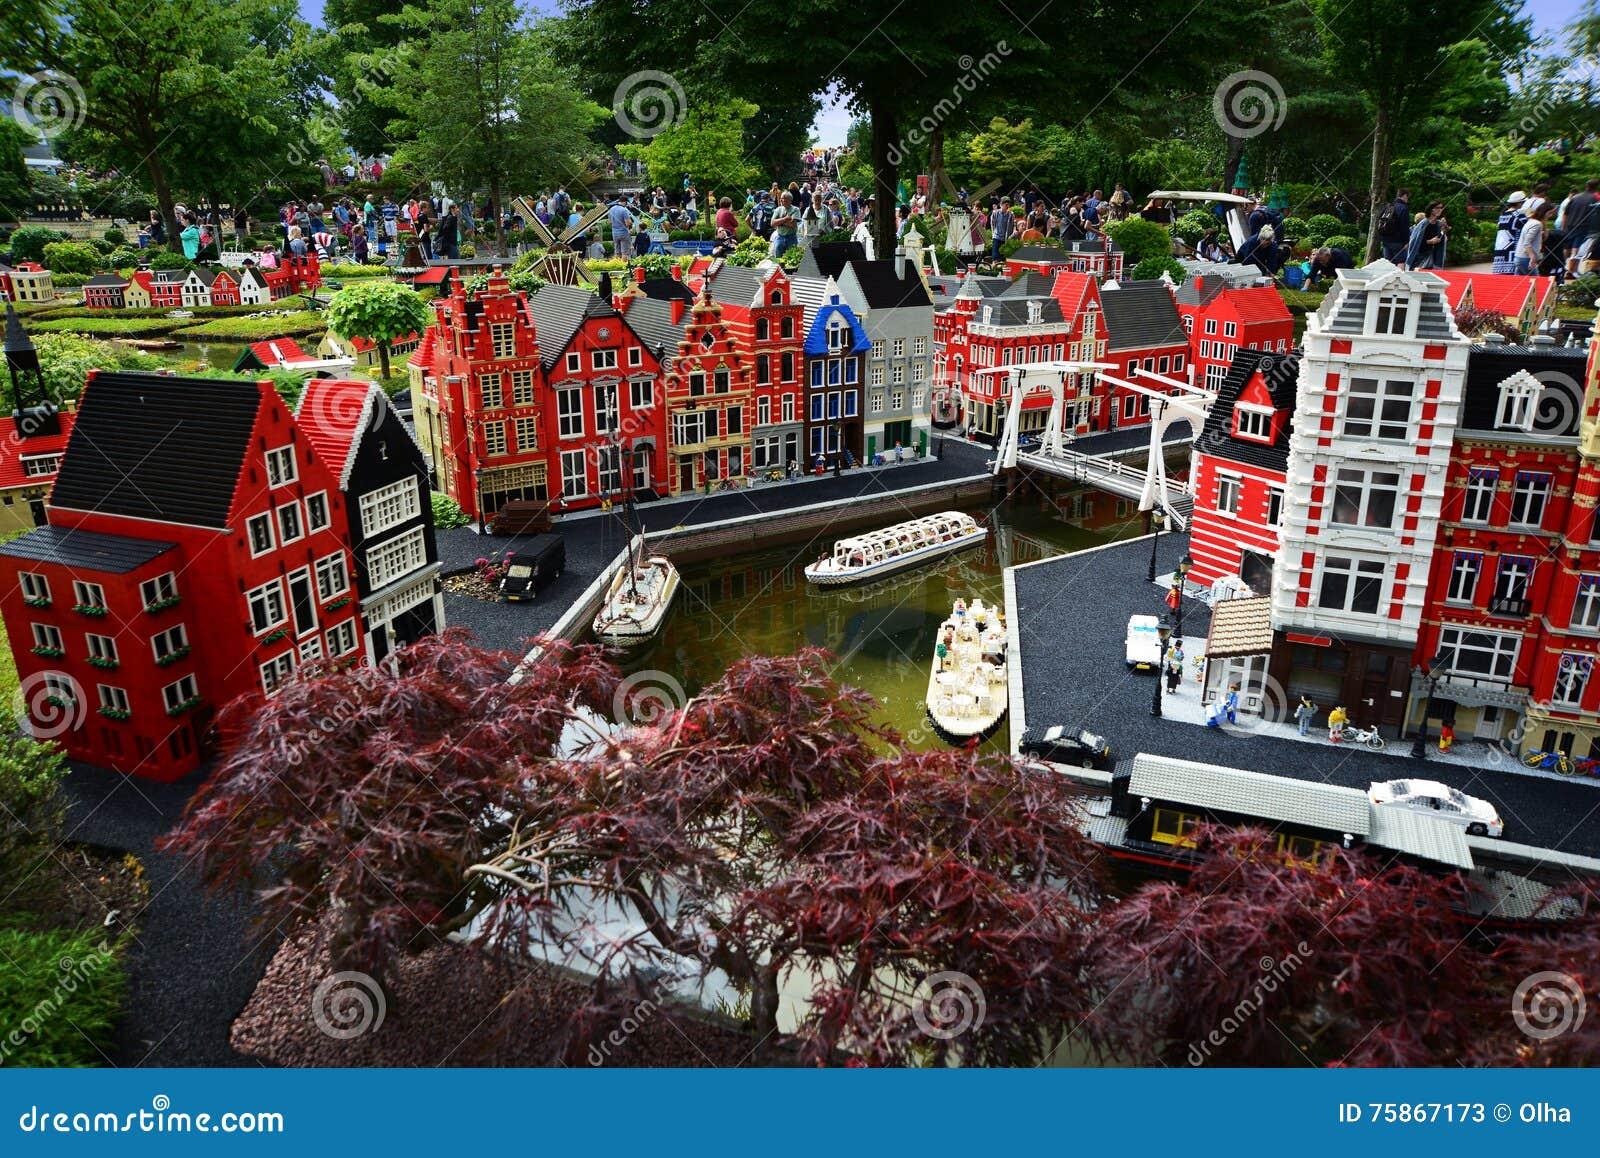 Billund denmark july 26 2016 lego houses in legoland for Sede lego danimarca